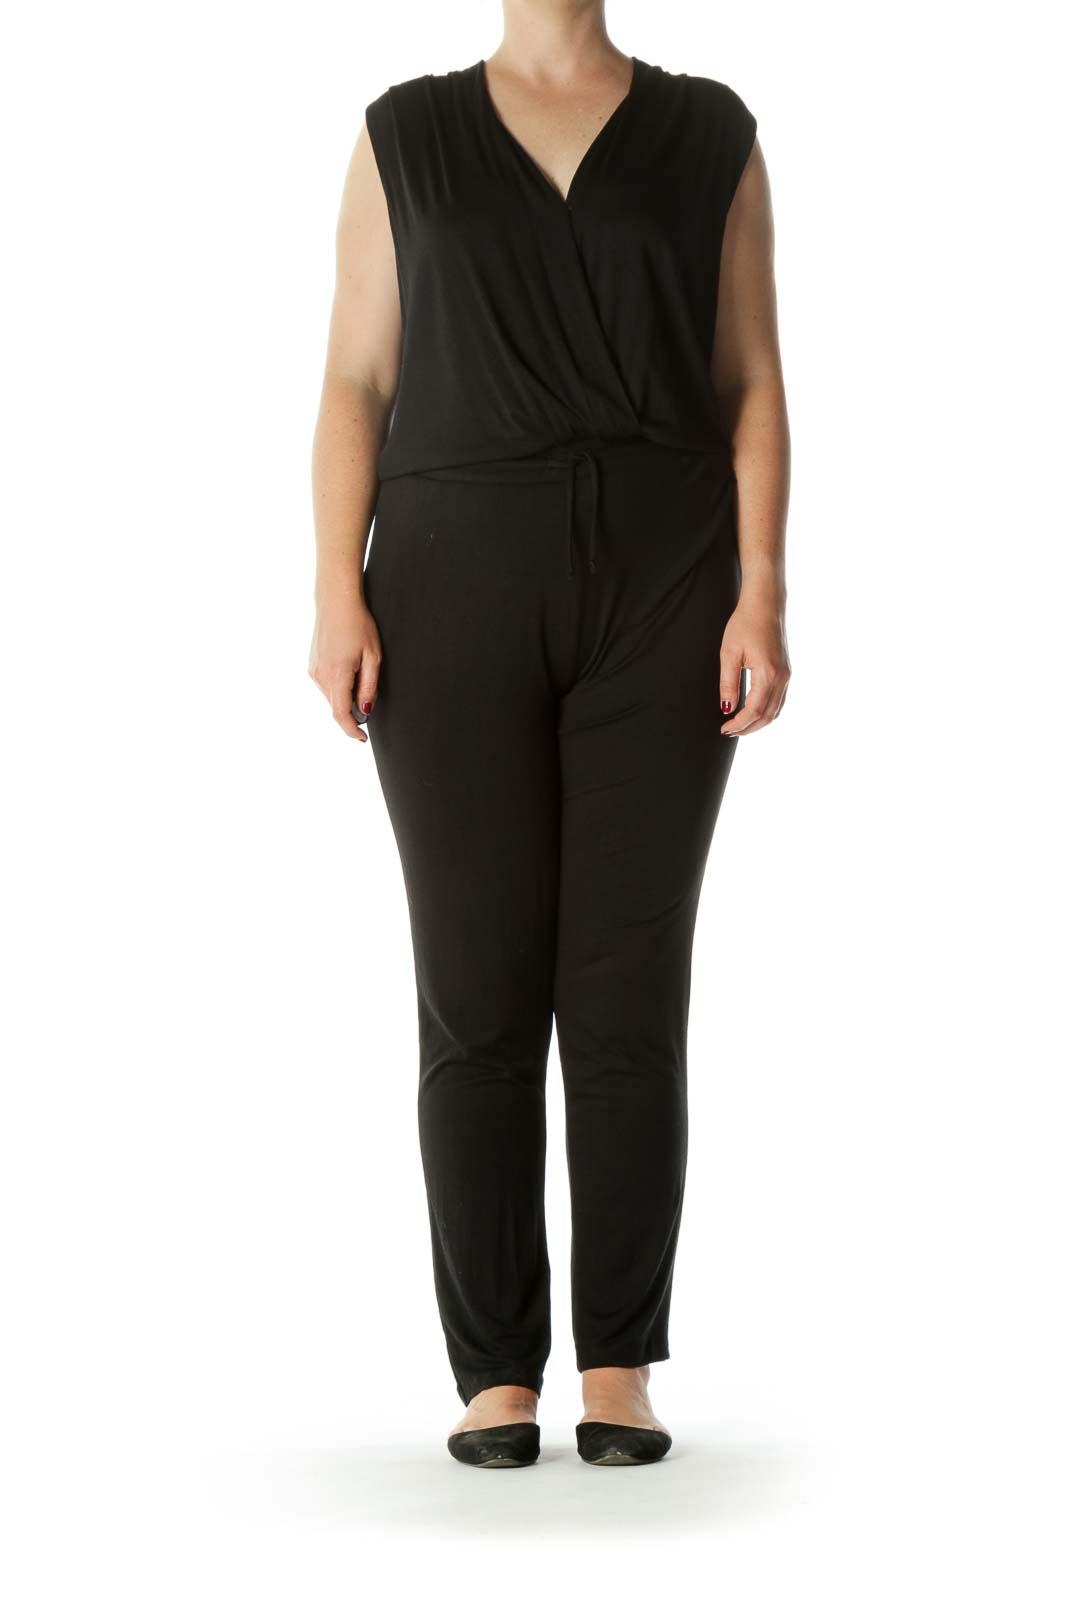 Black Super Soft-Texture Pocketed Drawstring Stretch Yoga Jumpsuit